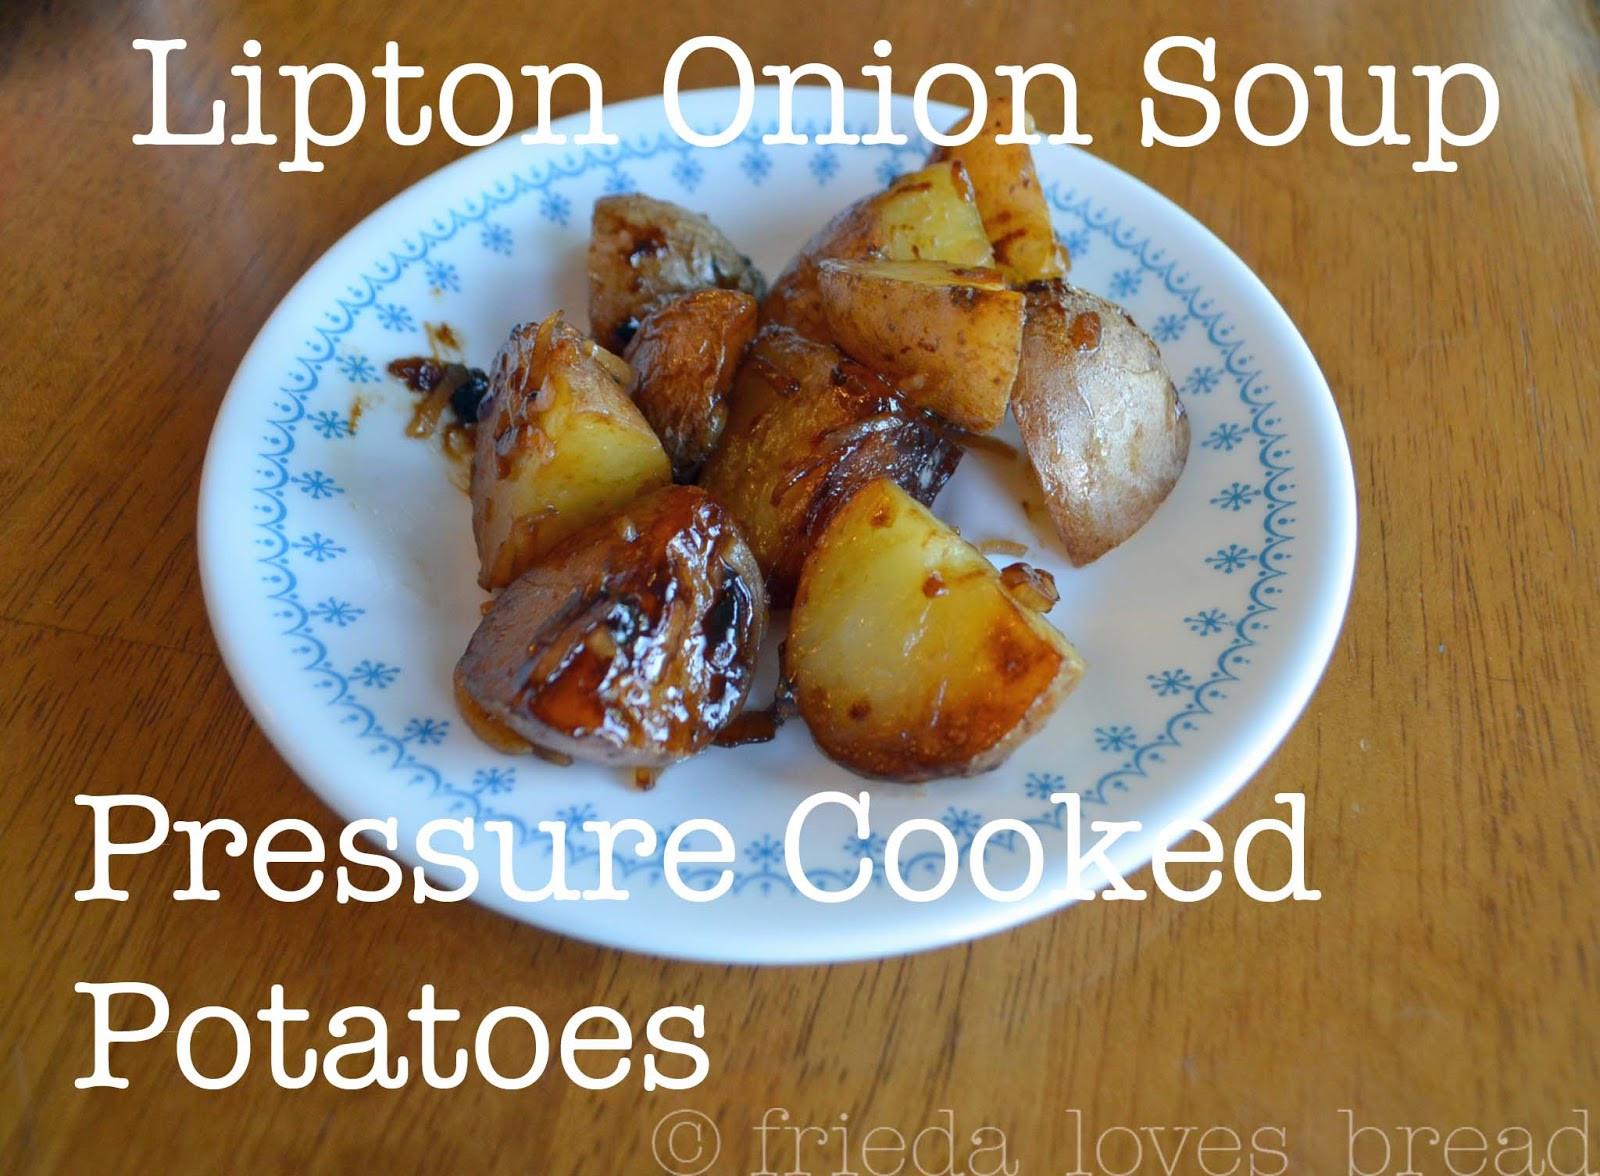 Lipton Onion Soup Potatoes  Frieda Loves Bread Pressure Cooked Lipton ion Soup Potatoes